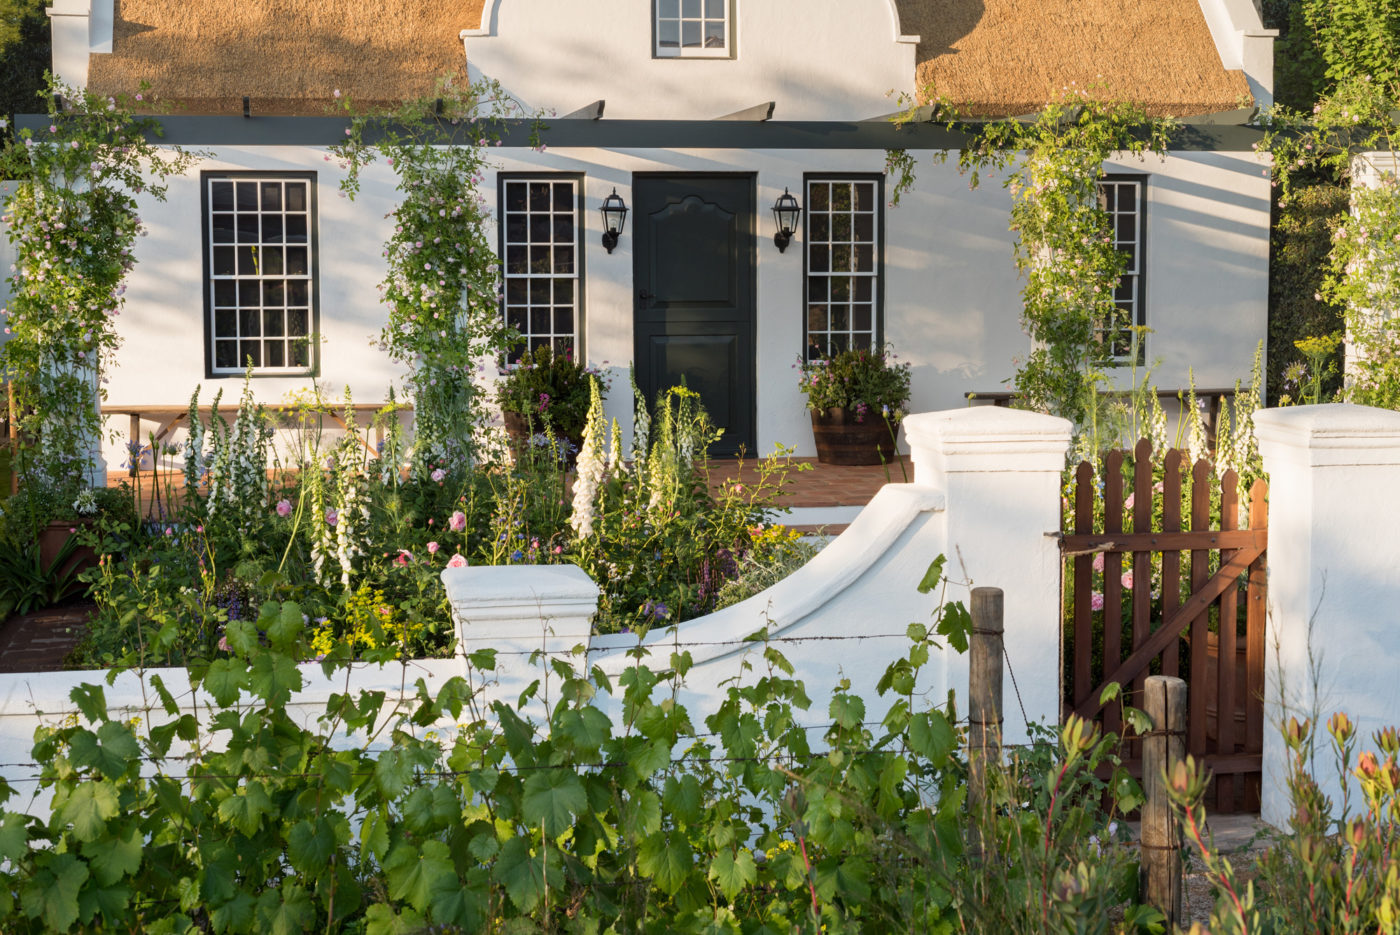 Home - Jonathan Snow - Landscape and Garden Design